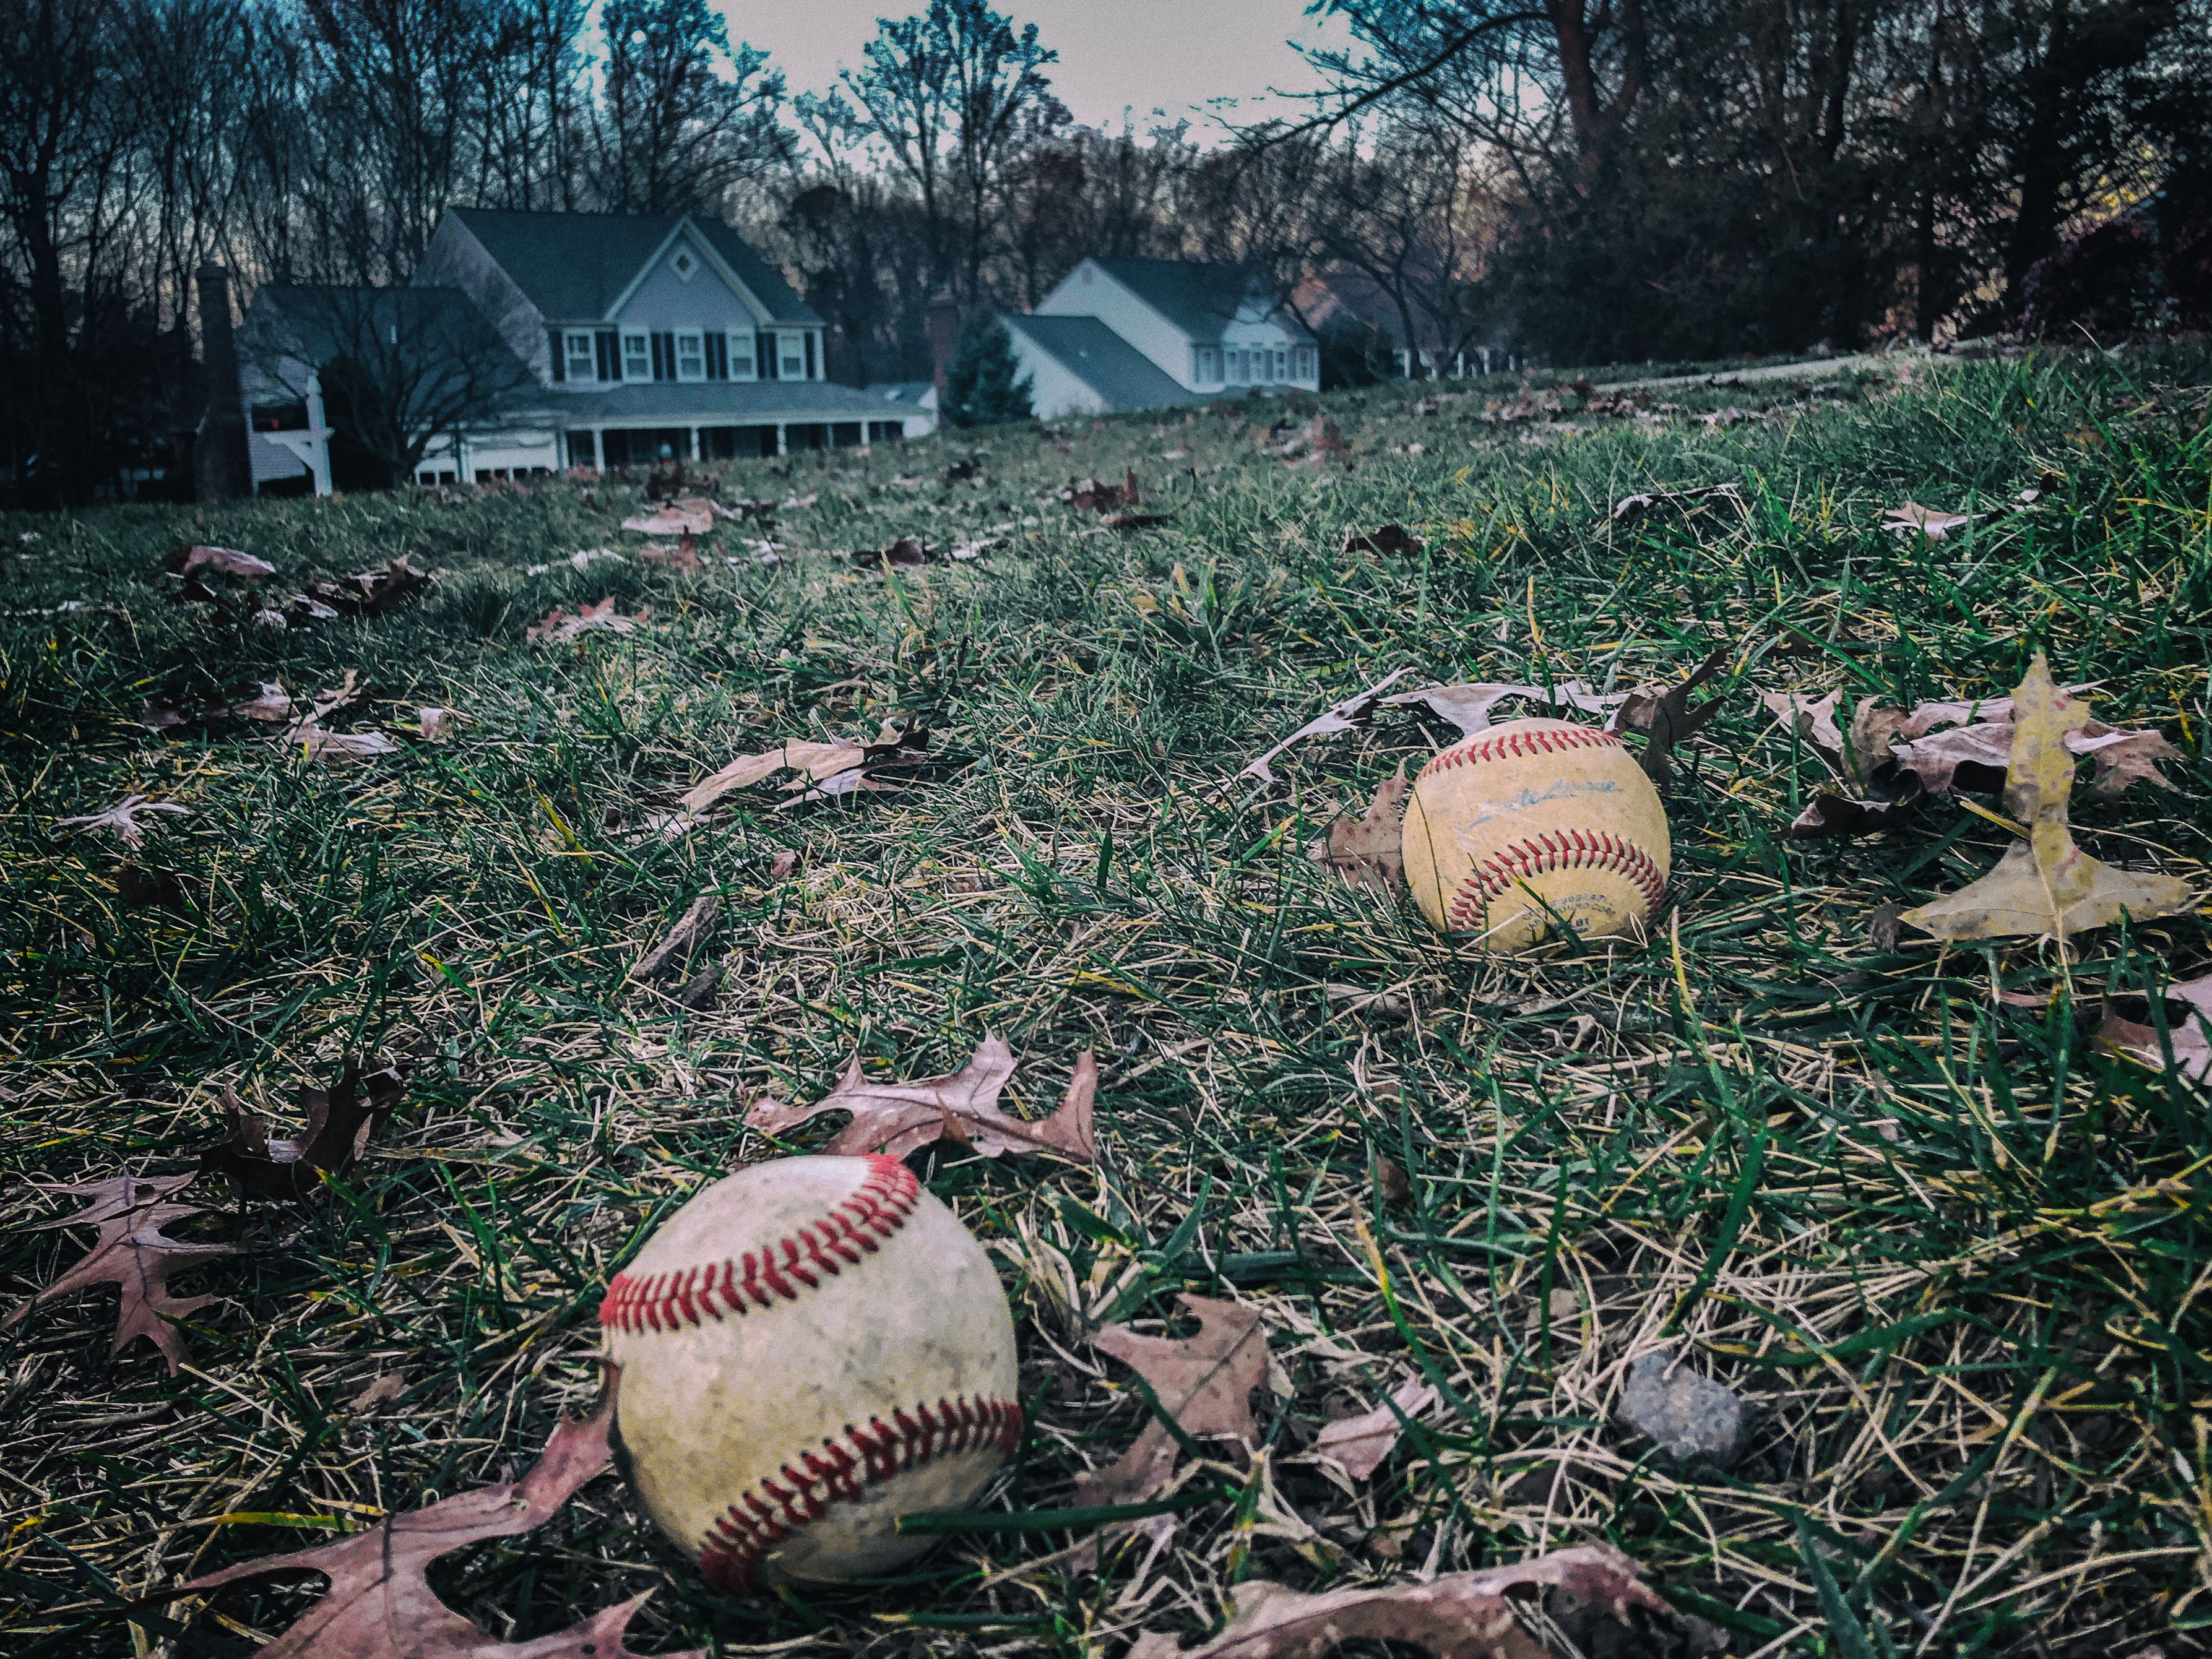 baseballs on lawn